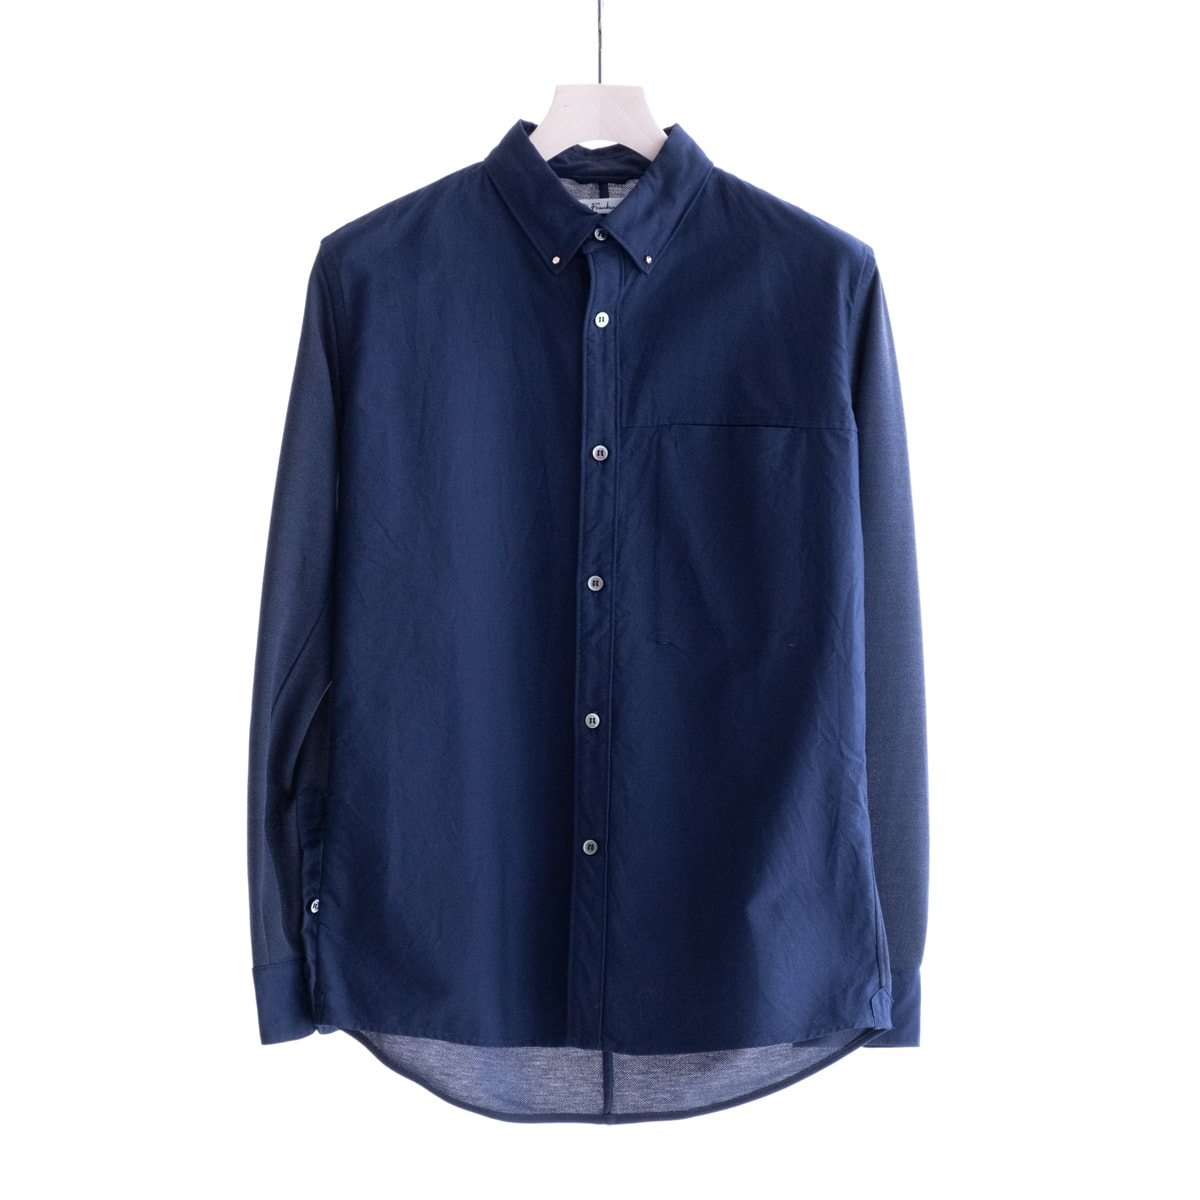 【SALE 40%OFF】 Dr.Franken Dr.Shirts BD OX (Navy) DF-S101 ドクターフランケン ドクターシャツ ボタンダウン オックスフォード オックス 異素材コンビ 日本製 メンズ 送料無料